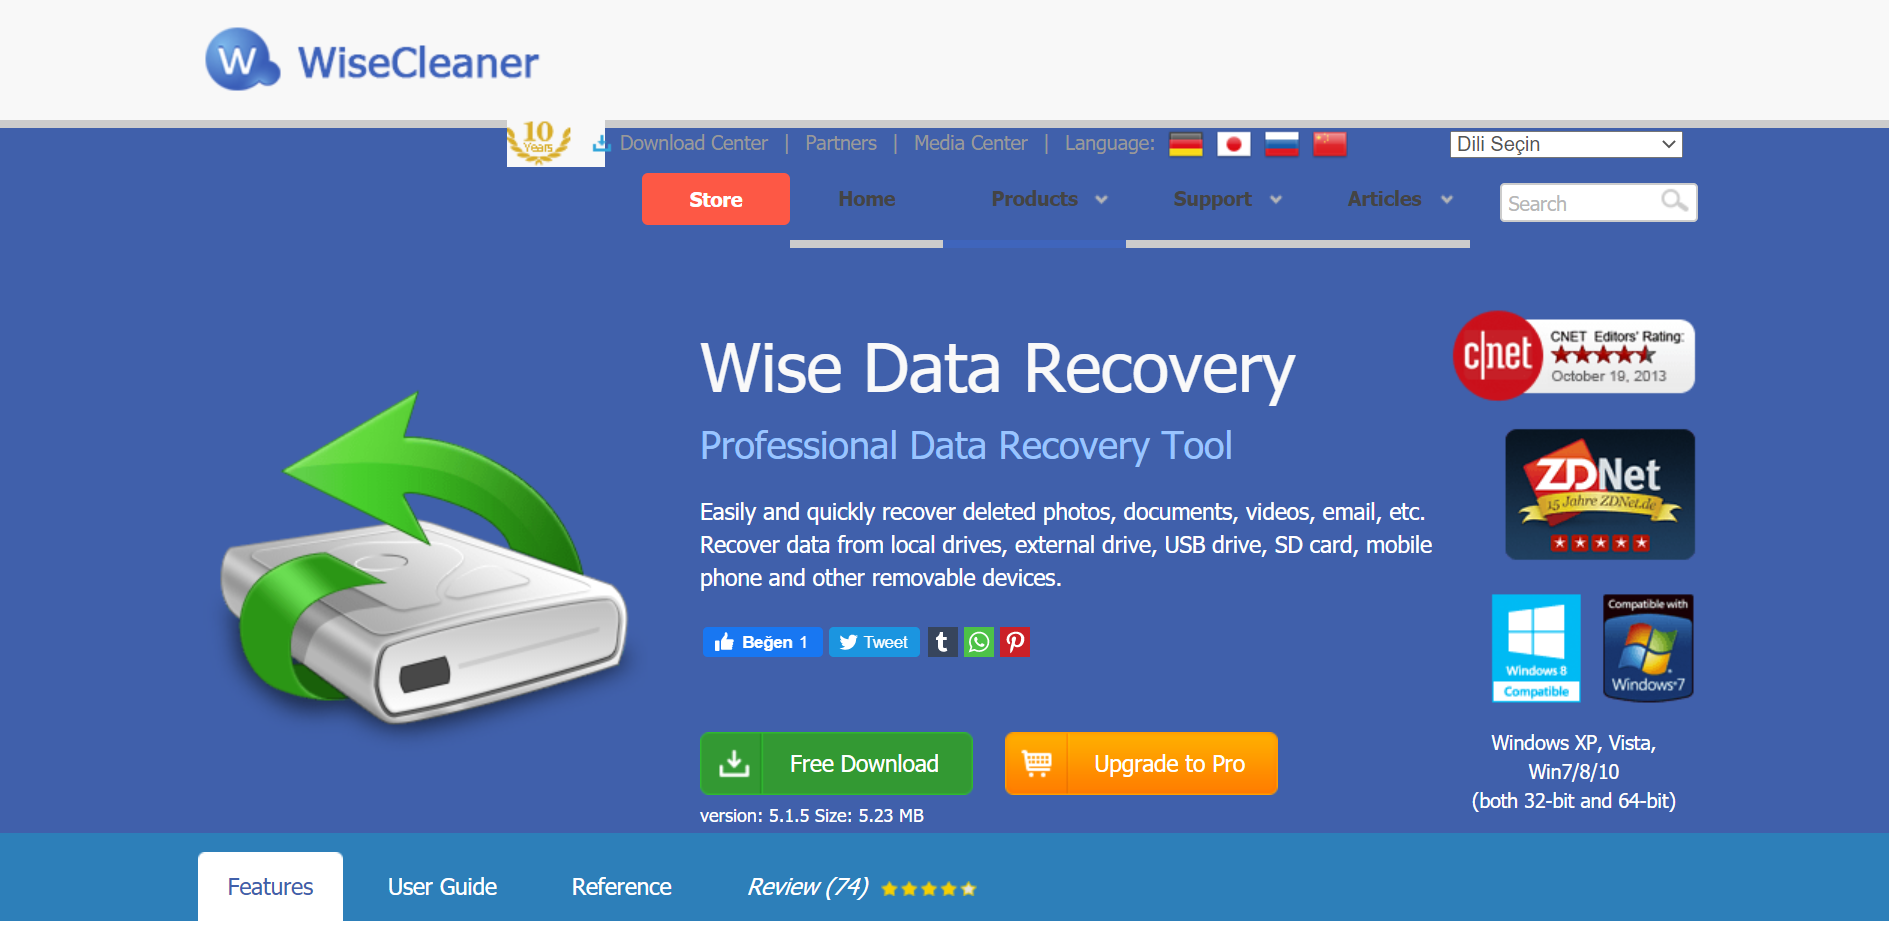 WiseCleaner Web sitesi